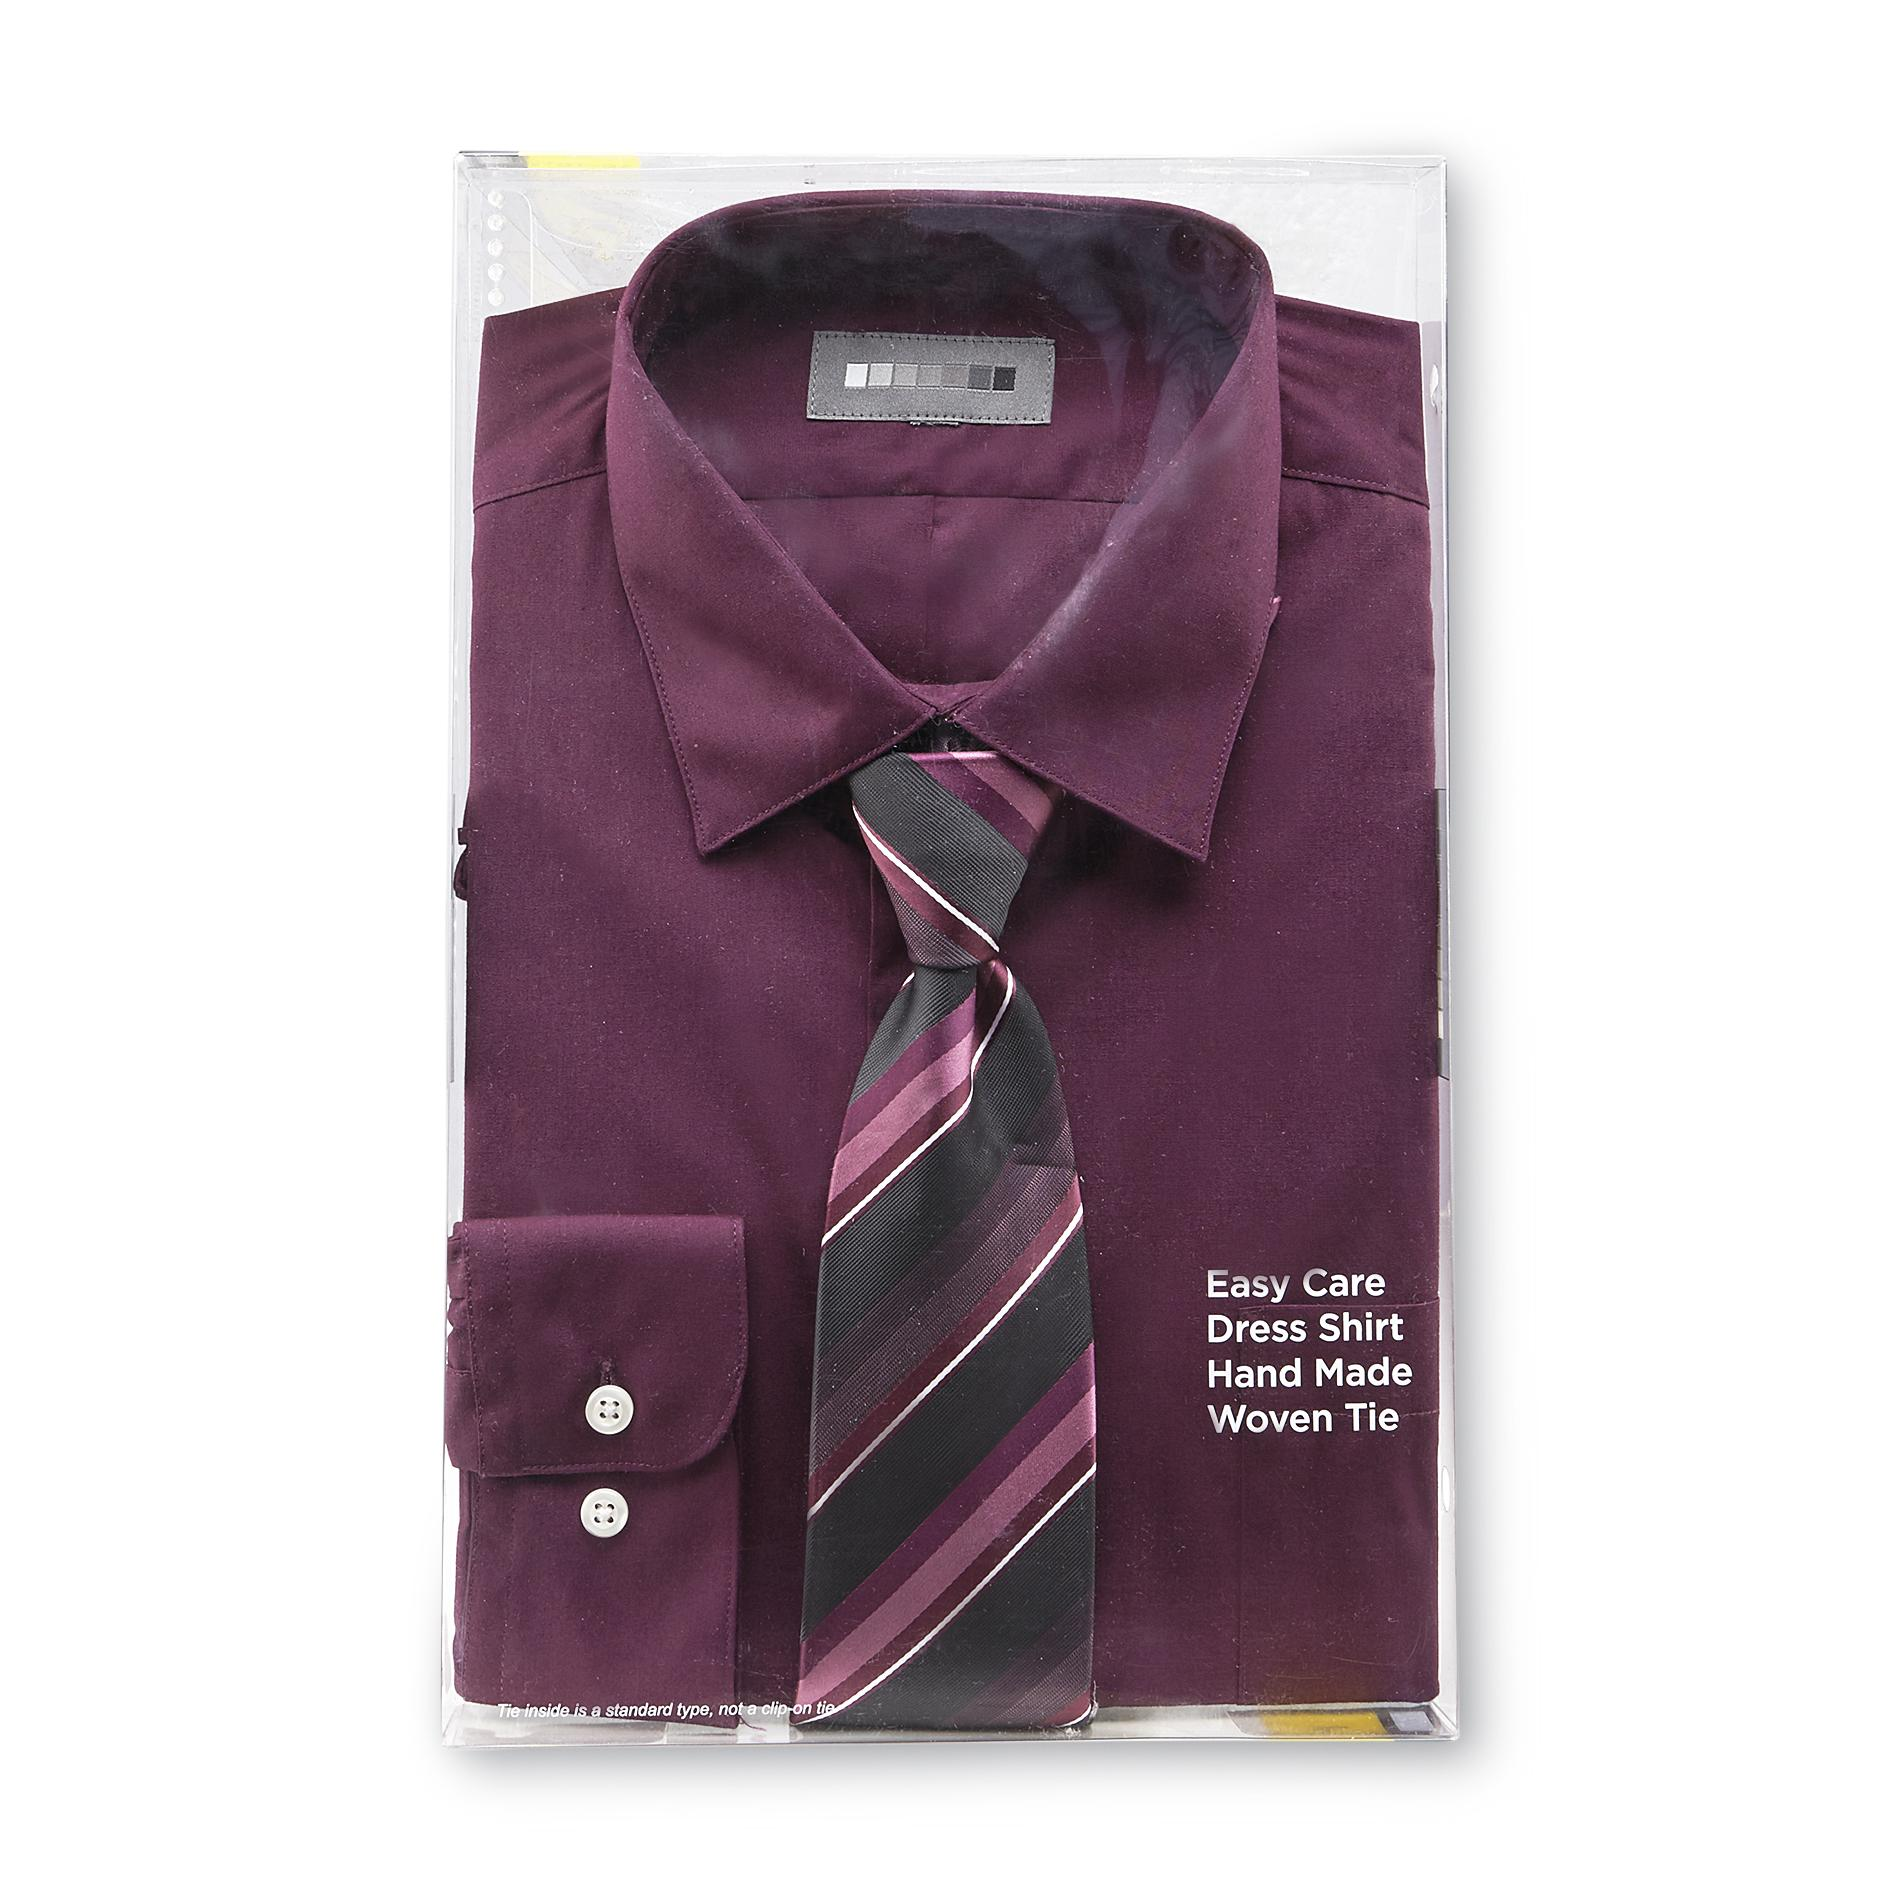 Covington Men's Easy Care Dress Shirt & Necktie - Striped